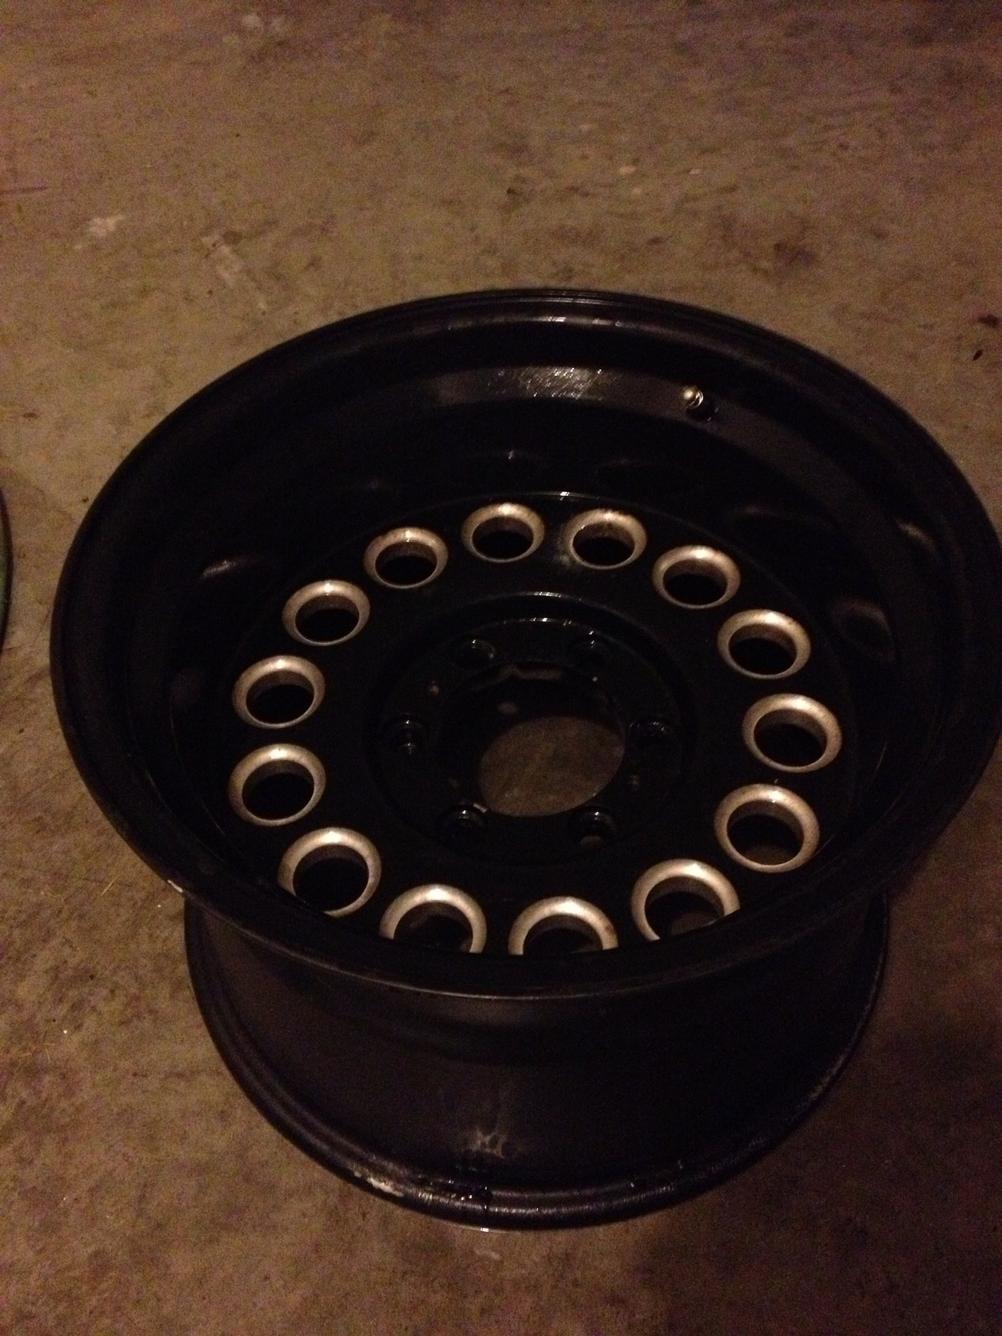 FS: Eagle Alloy 100 series black 6x5.5, $300 St. Louis, MO ...